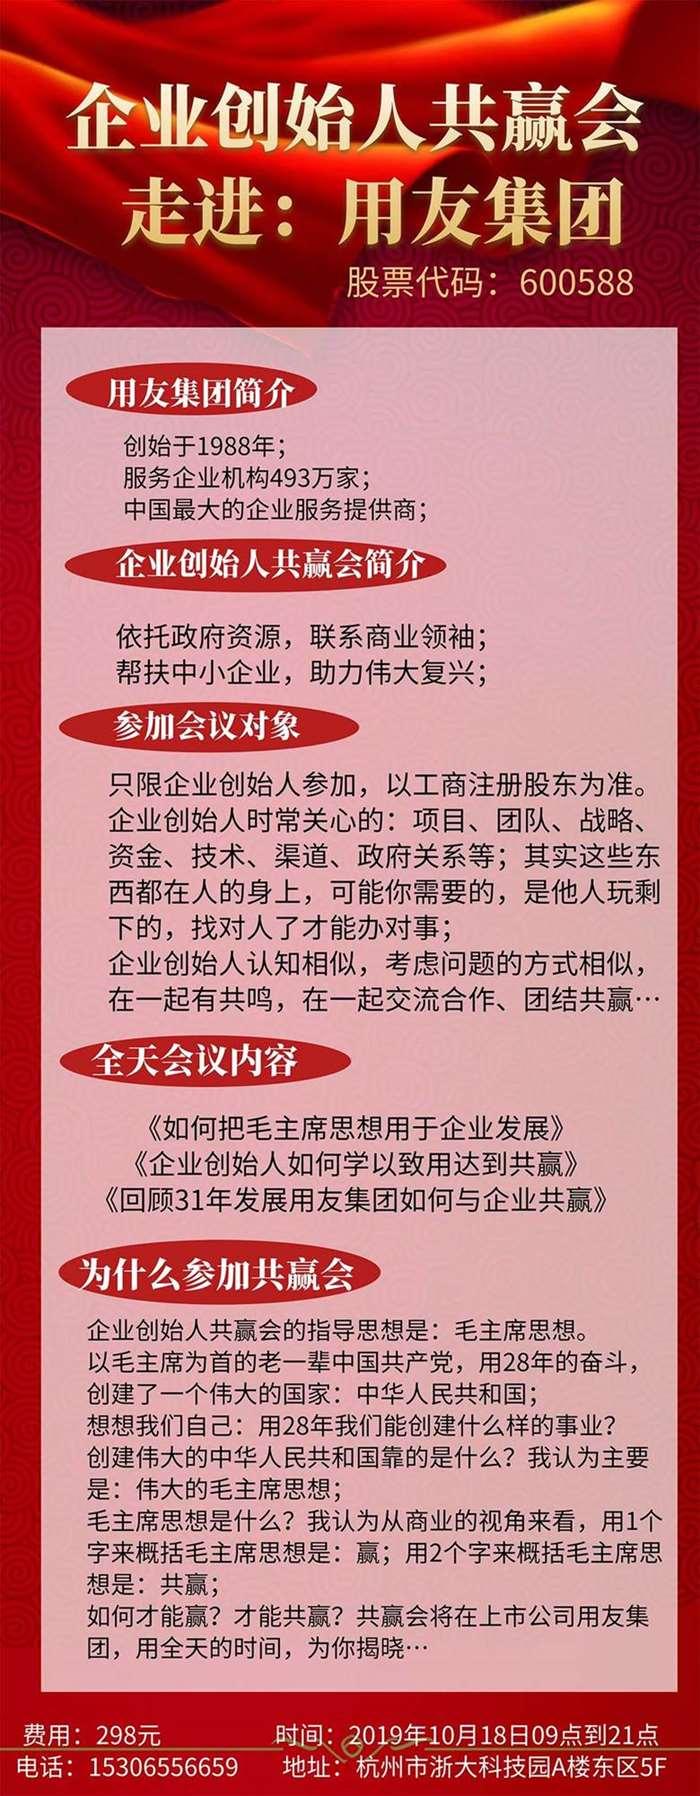 http://www.huodongxing.com/file/20170731/7332768912447/473574937786996.jpg